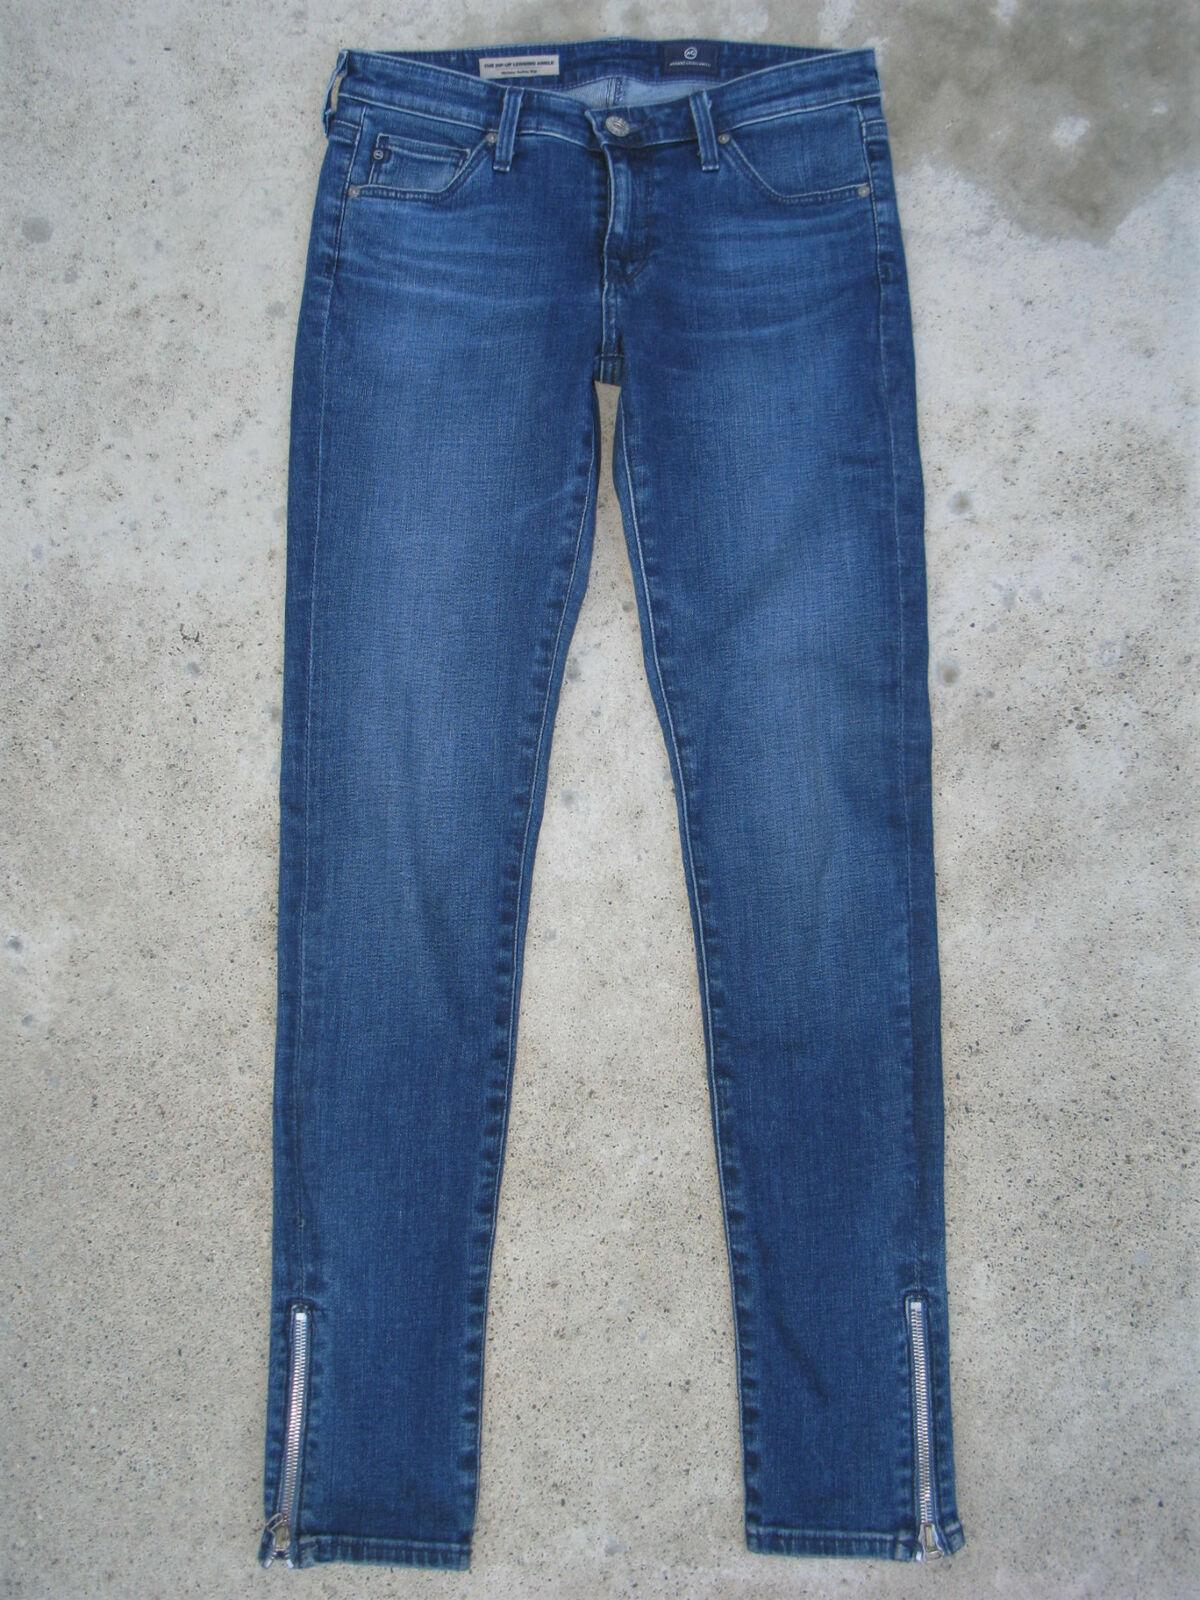 AG ADRIANO goldSCHMIED Zip-Up Legging Ankle Jean Sz 26 Skinny Distressed Stretch